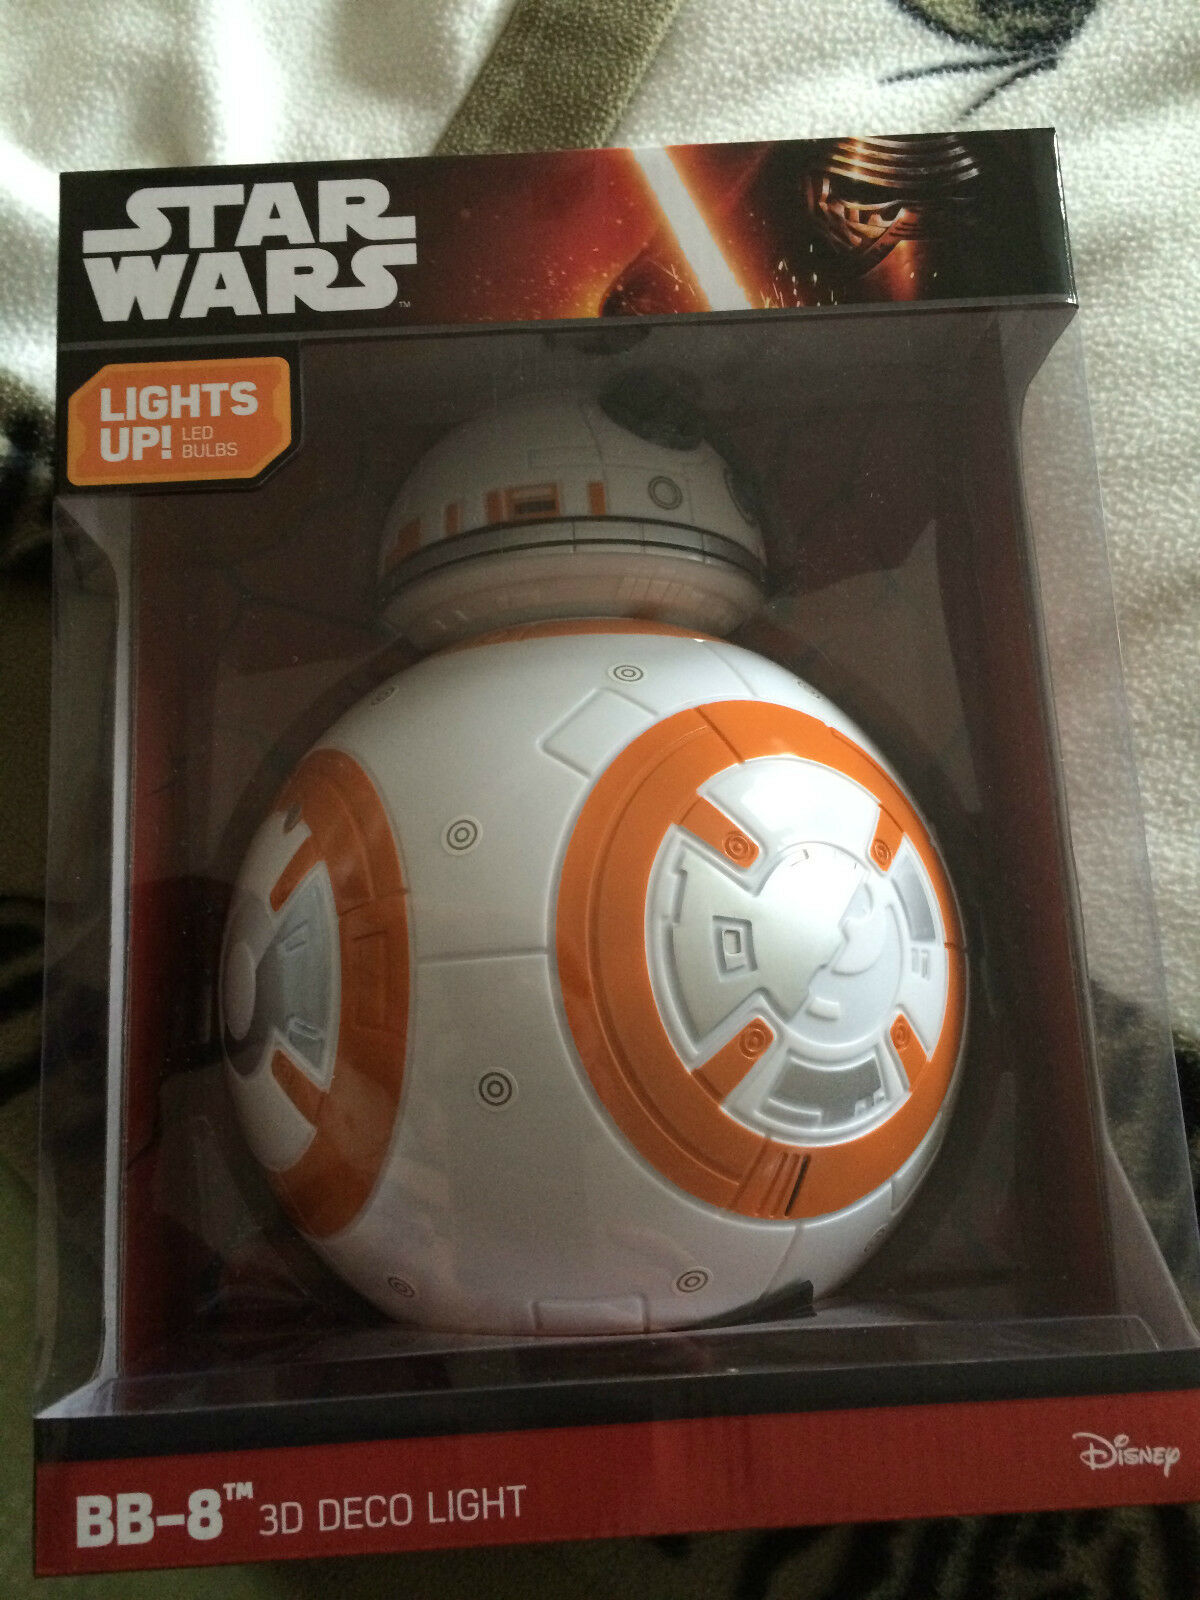 Star wars force weckt bb-8 3d - deco wand licht